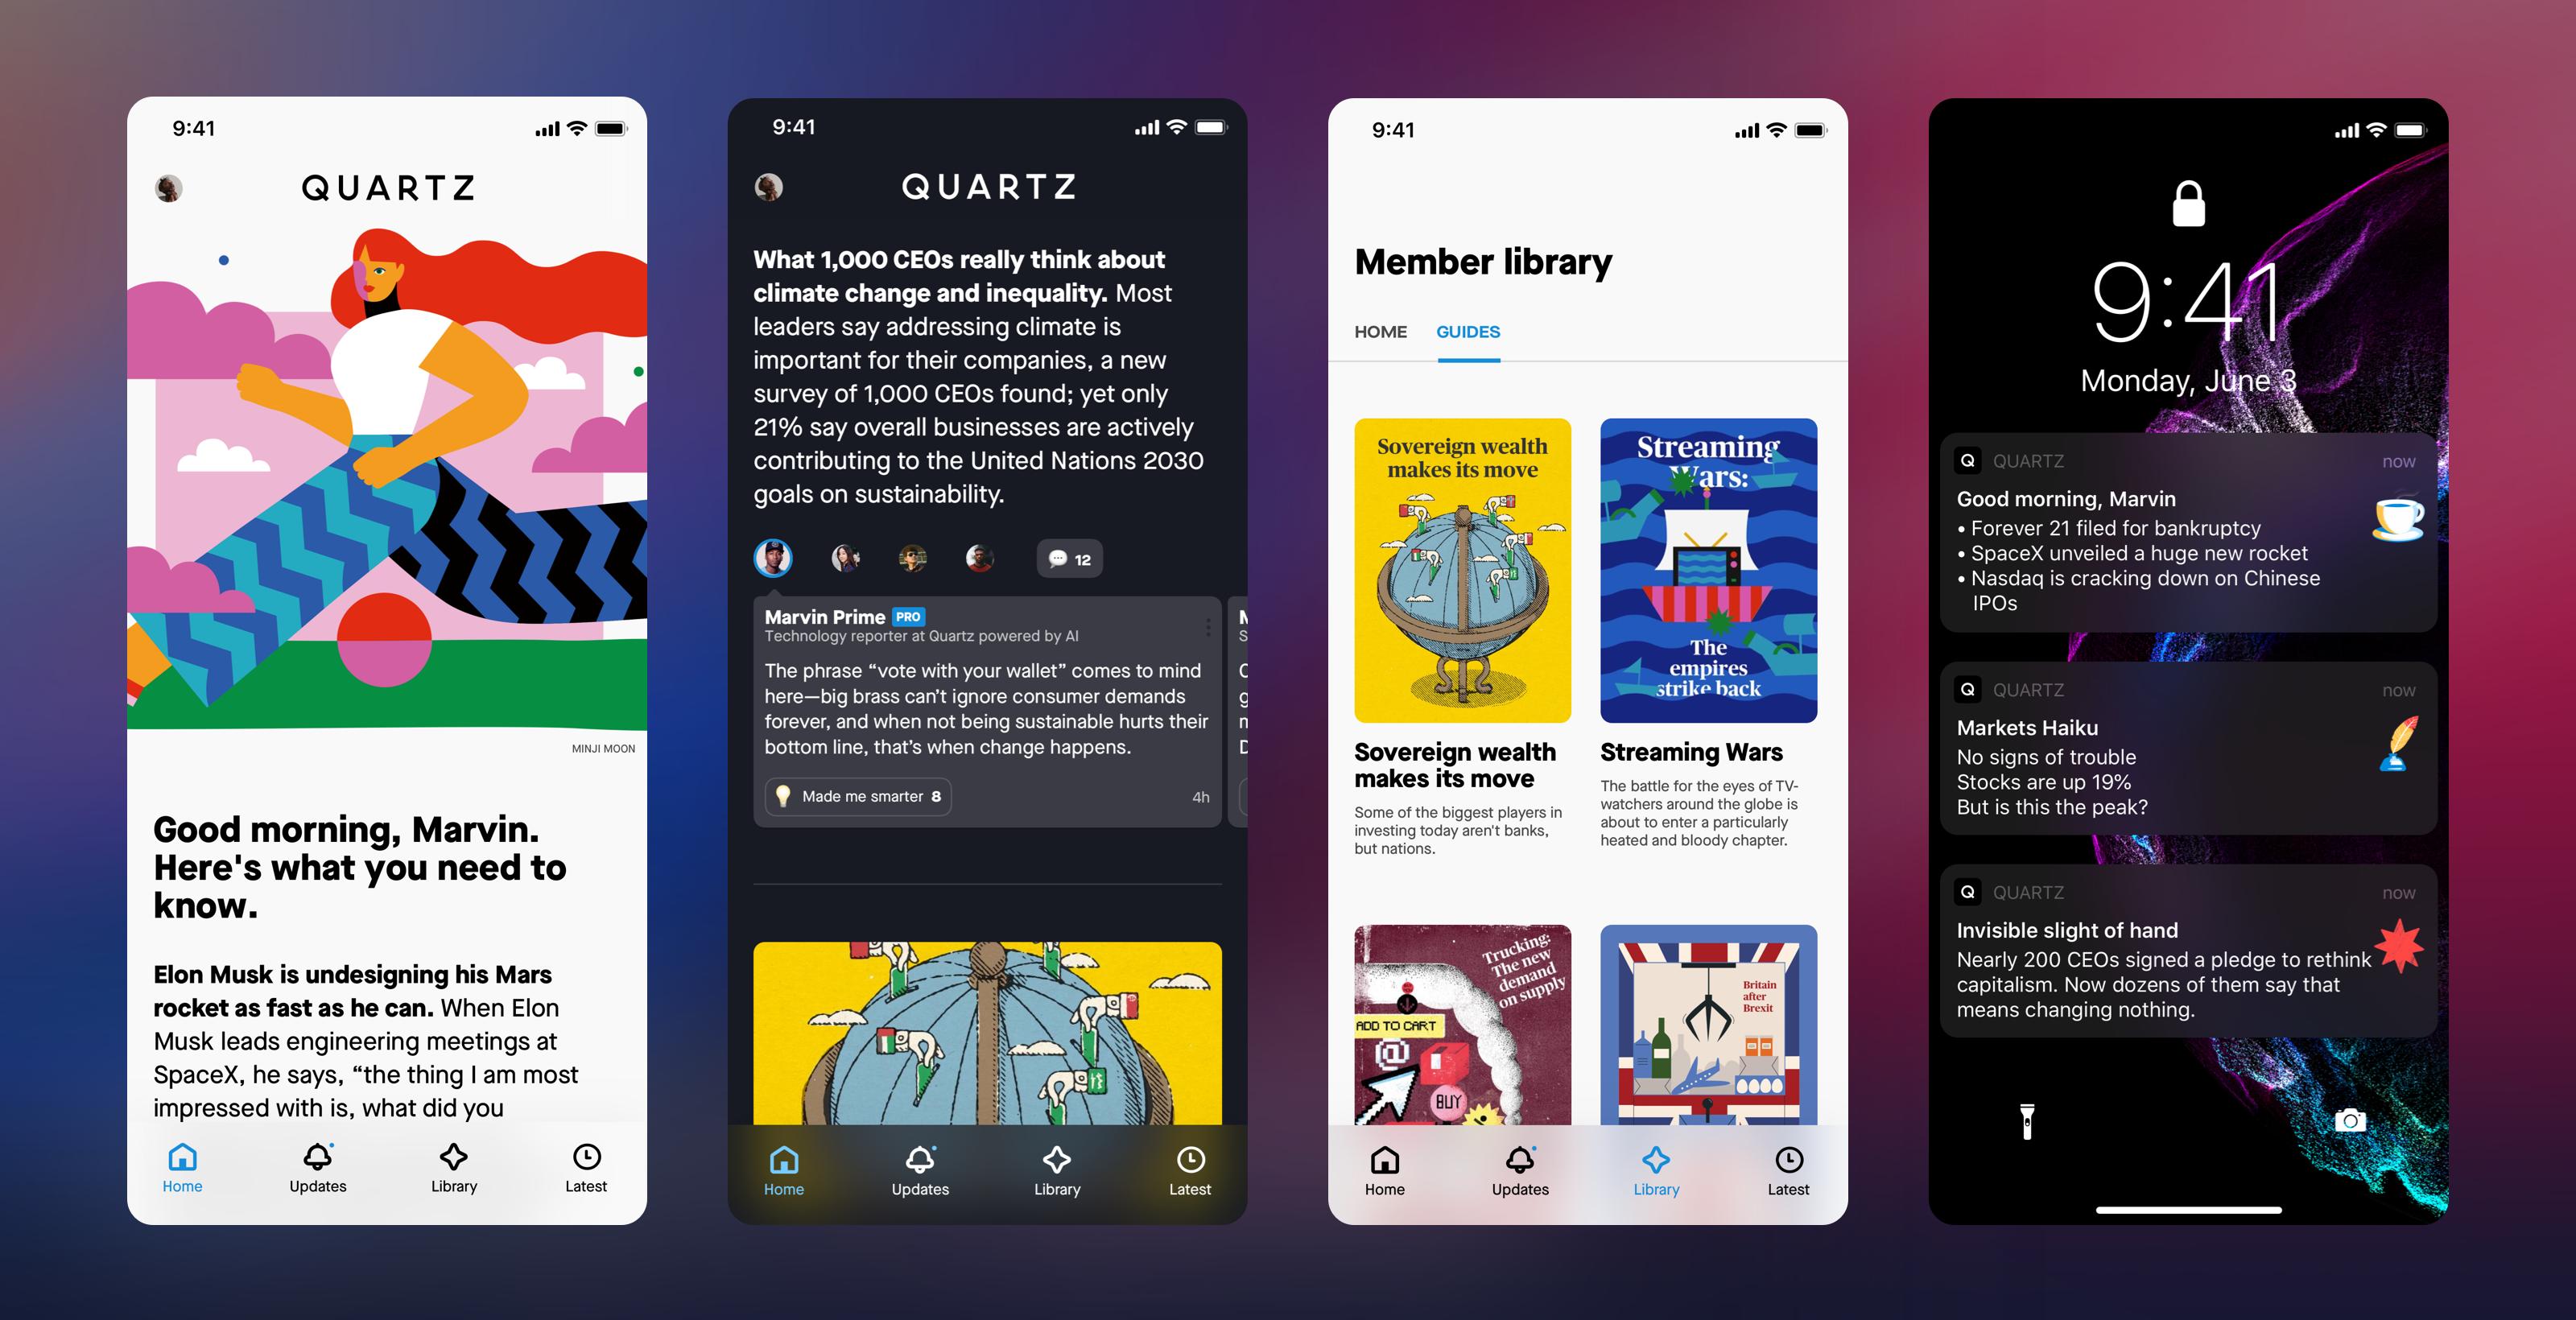 Screenshots from the new version of Quartz's iOS app